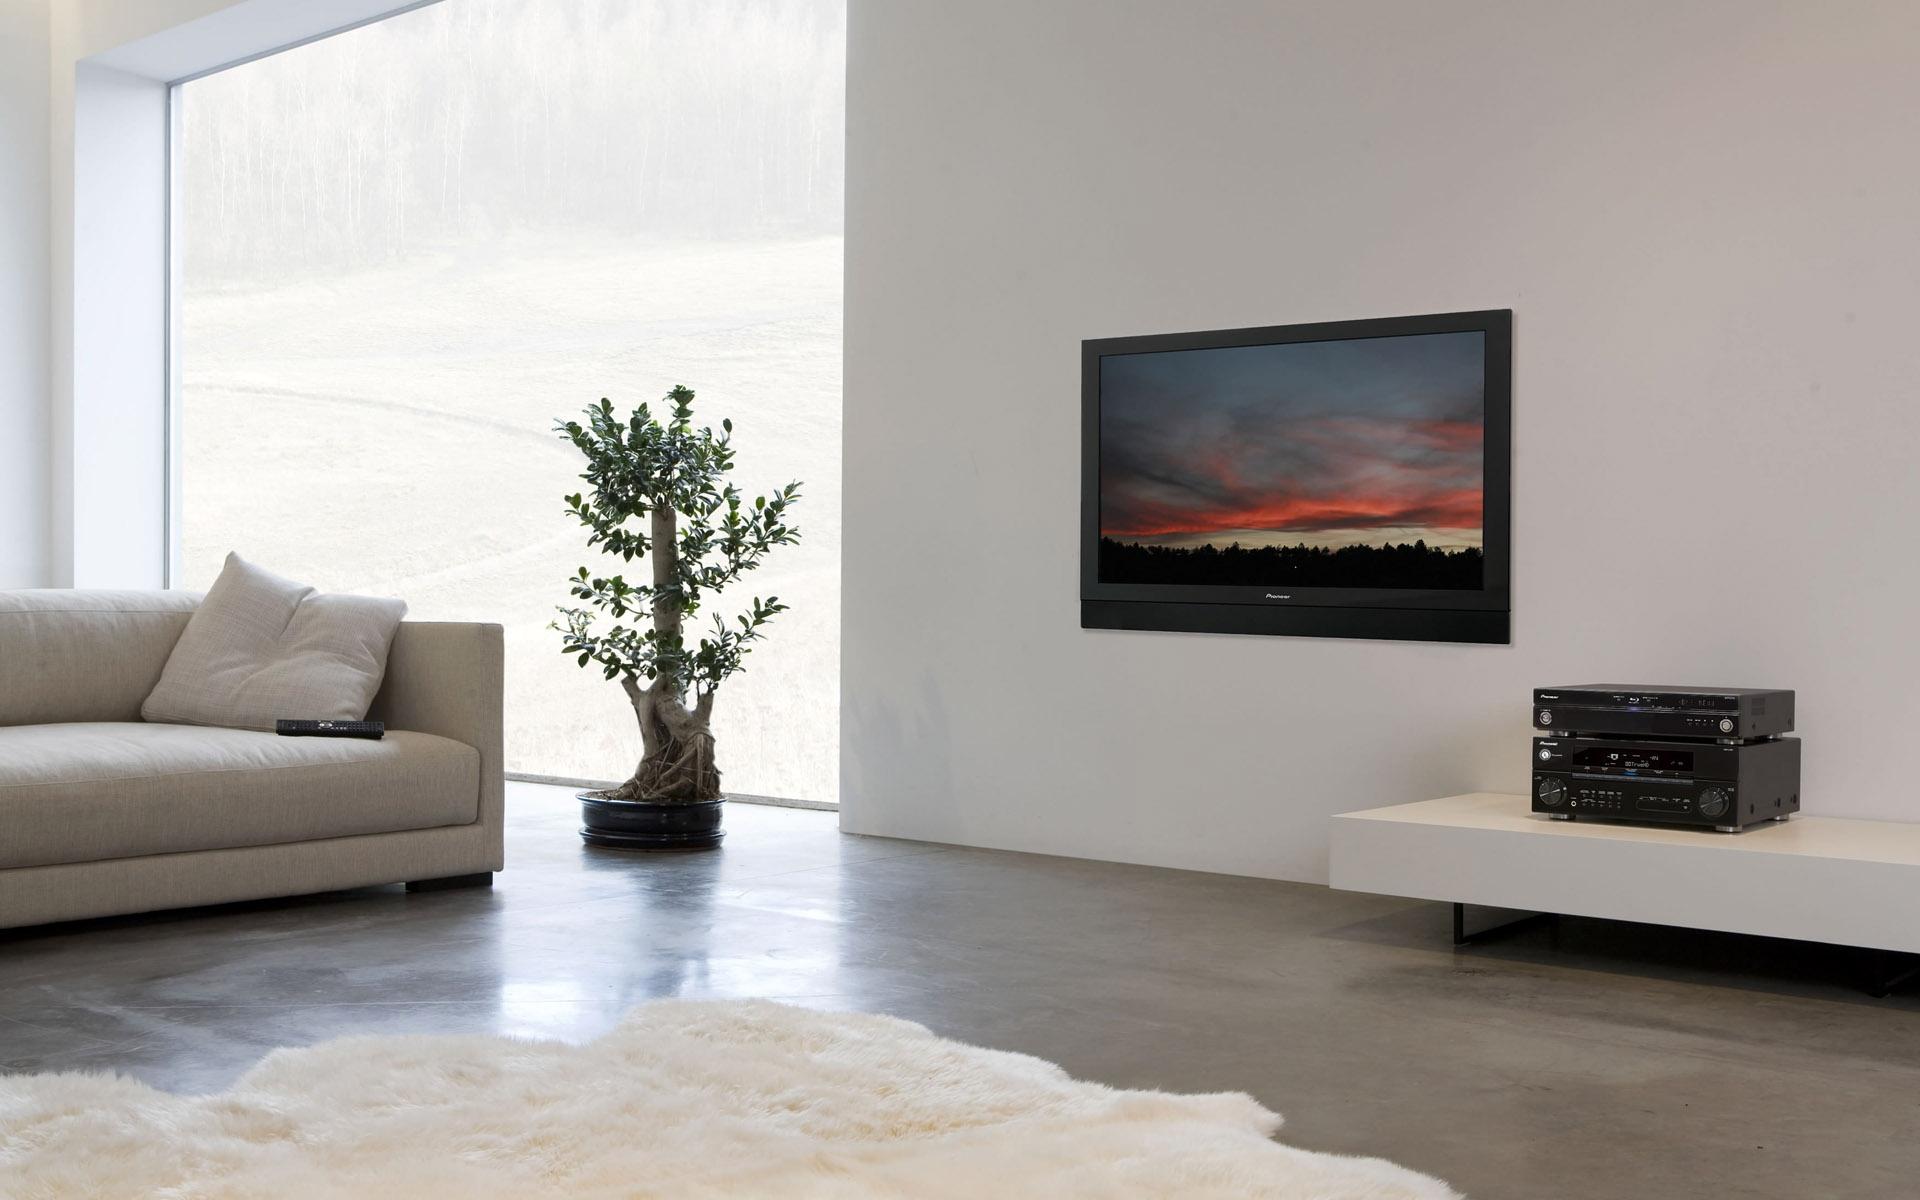 Fabelhaft Moderne Bodenbeläge Beste Wahl Zimmer Innere Mauer Holz Kamin Fernseher Innenarchitektur